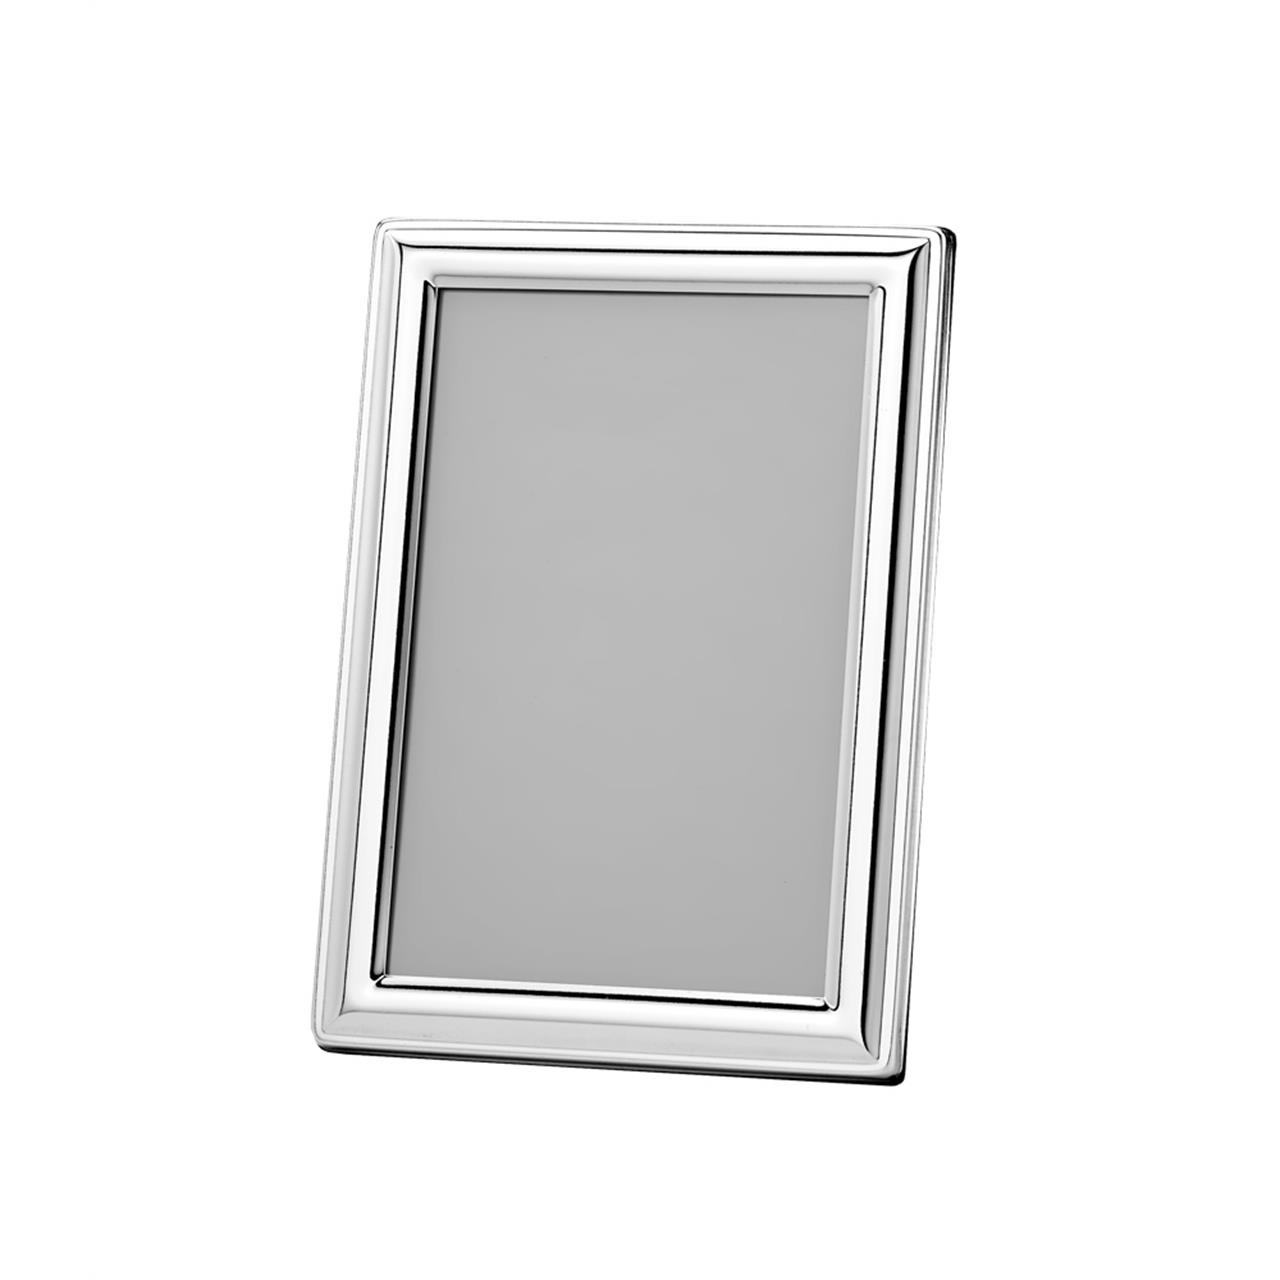 Silbergalerie | Bilderrahmen Detmold 10x15 cm versilbert |Franzen ...